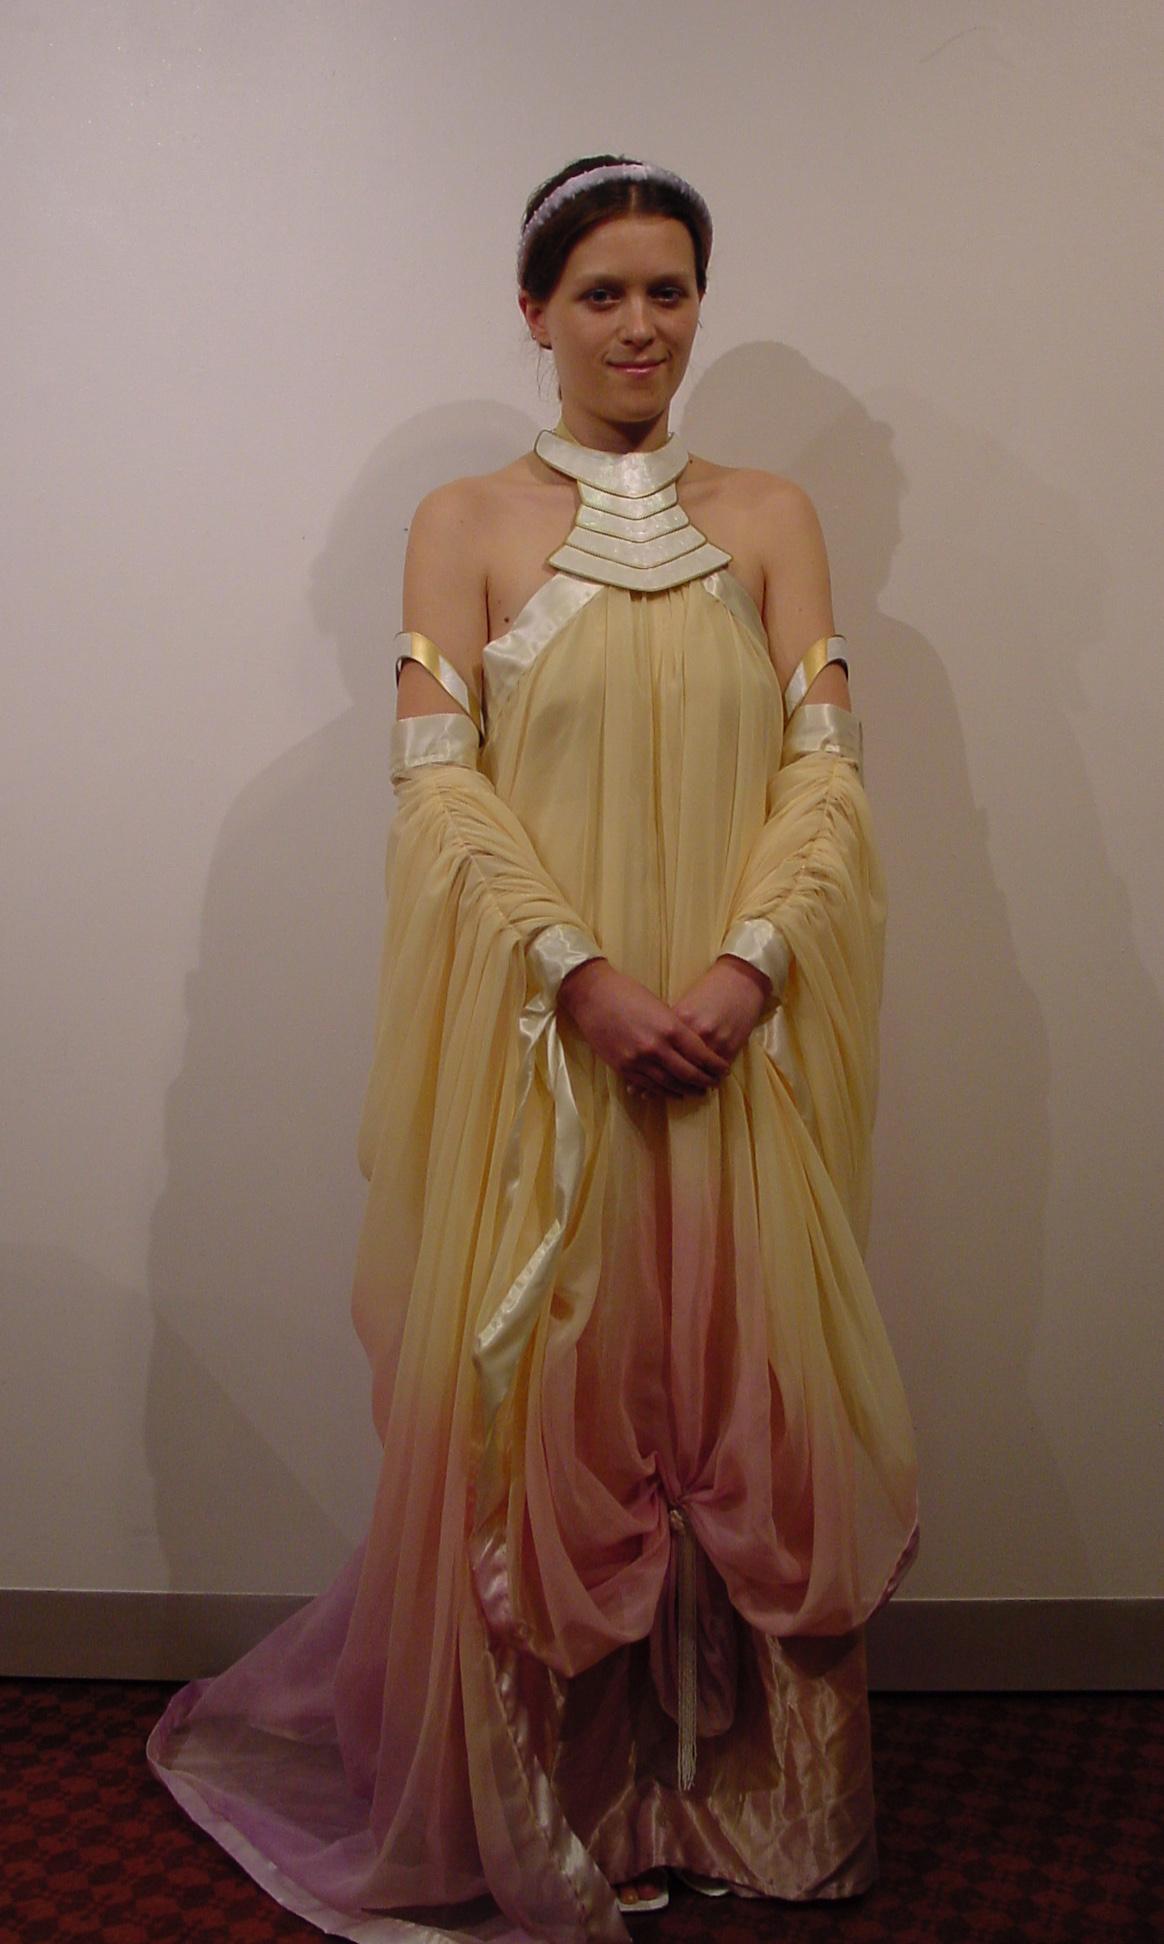 Fluidr / Padme\' Amidala Lake Dress by Matt & Kristy